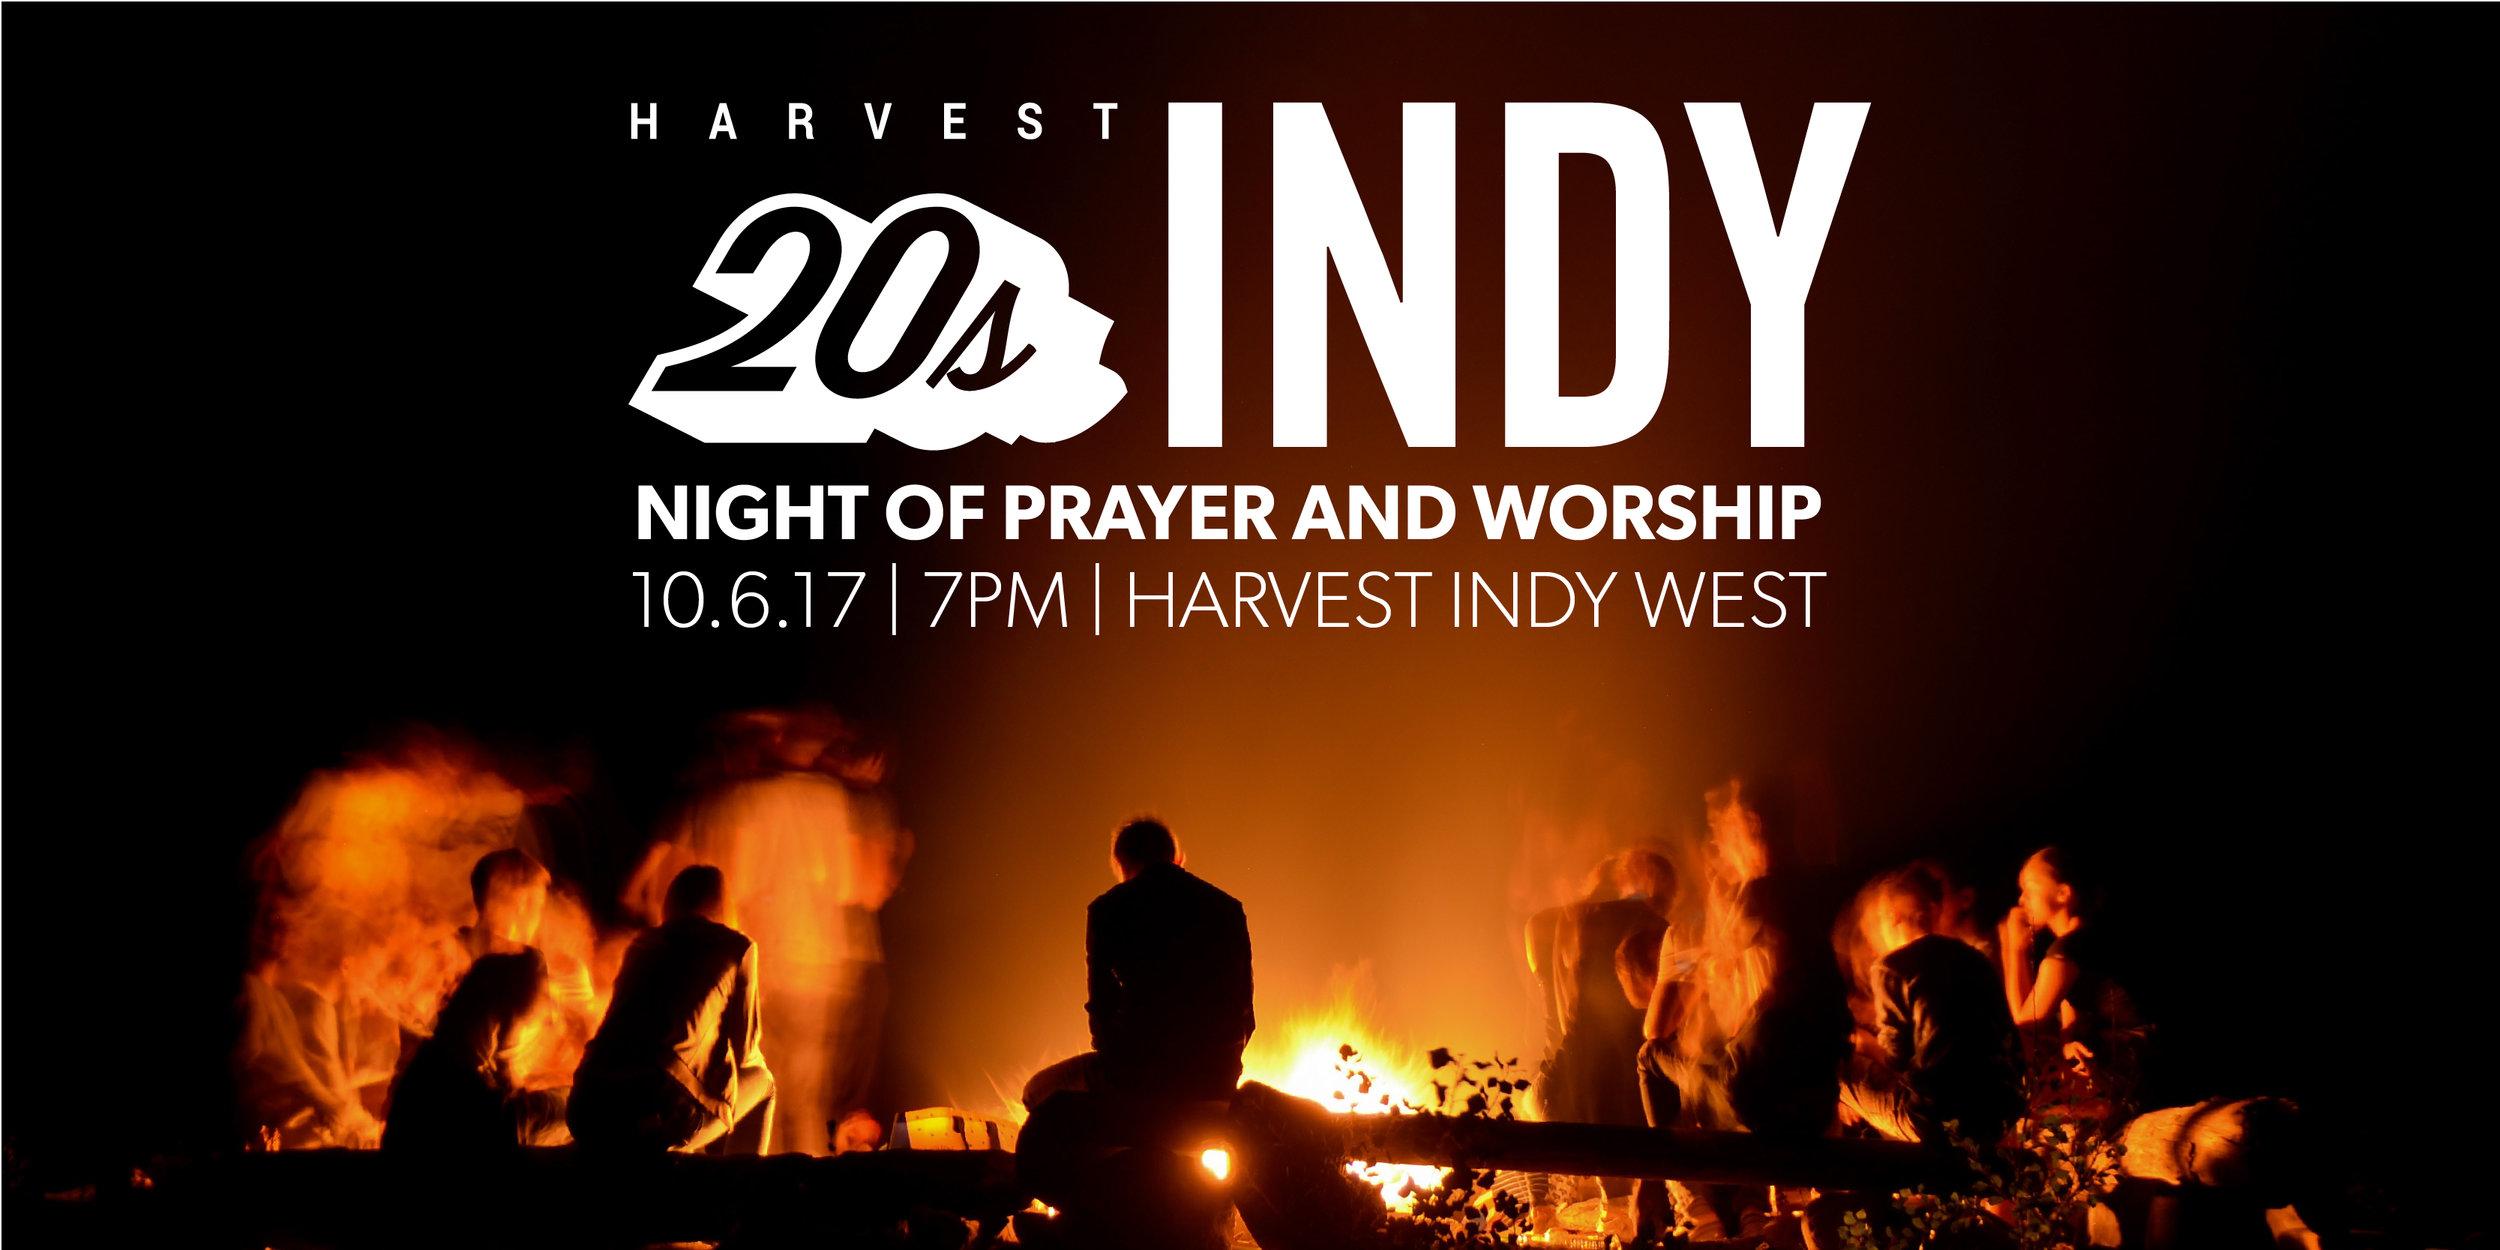 Harvest20s-nightofprayer-01.jpg